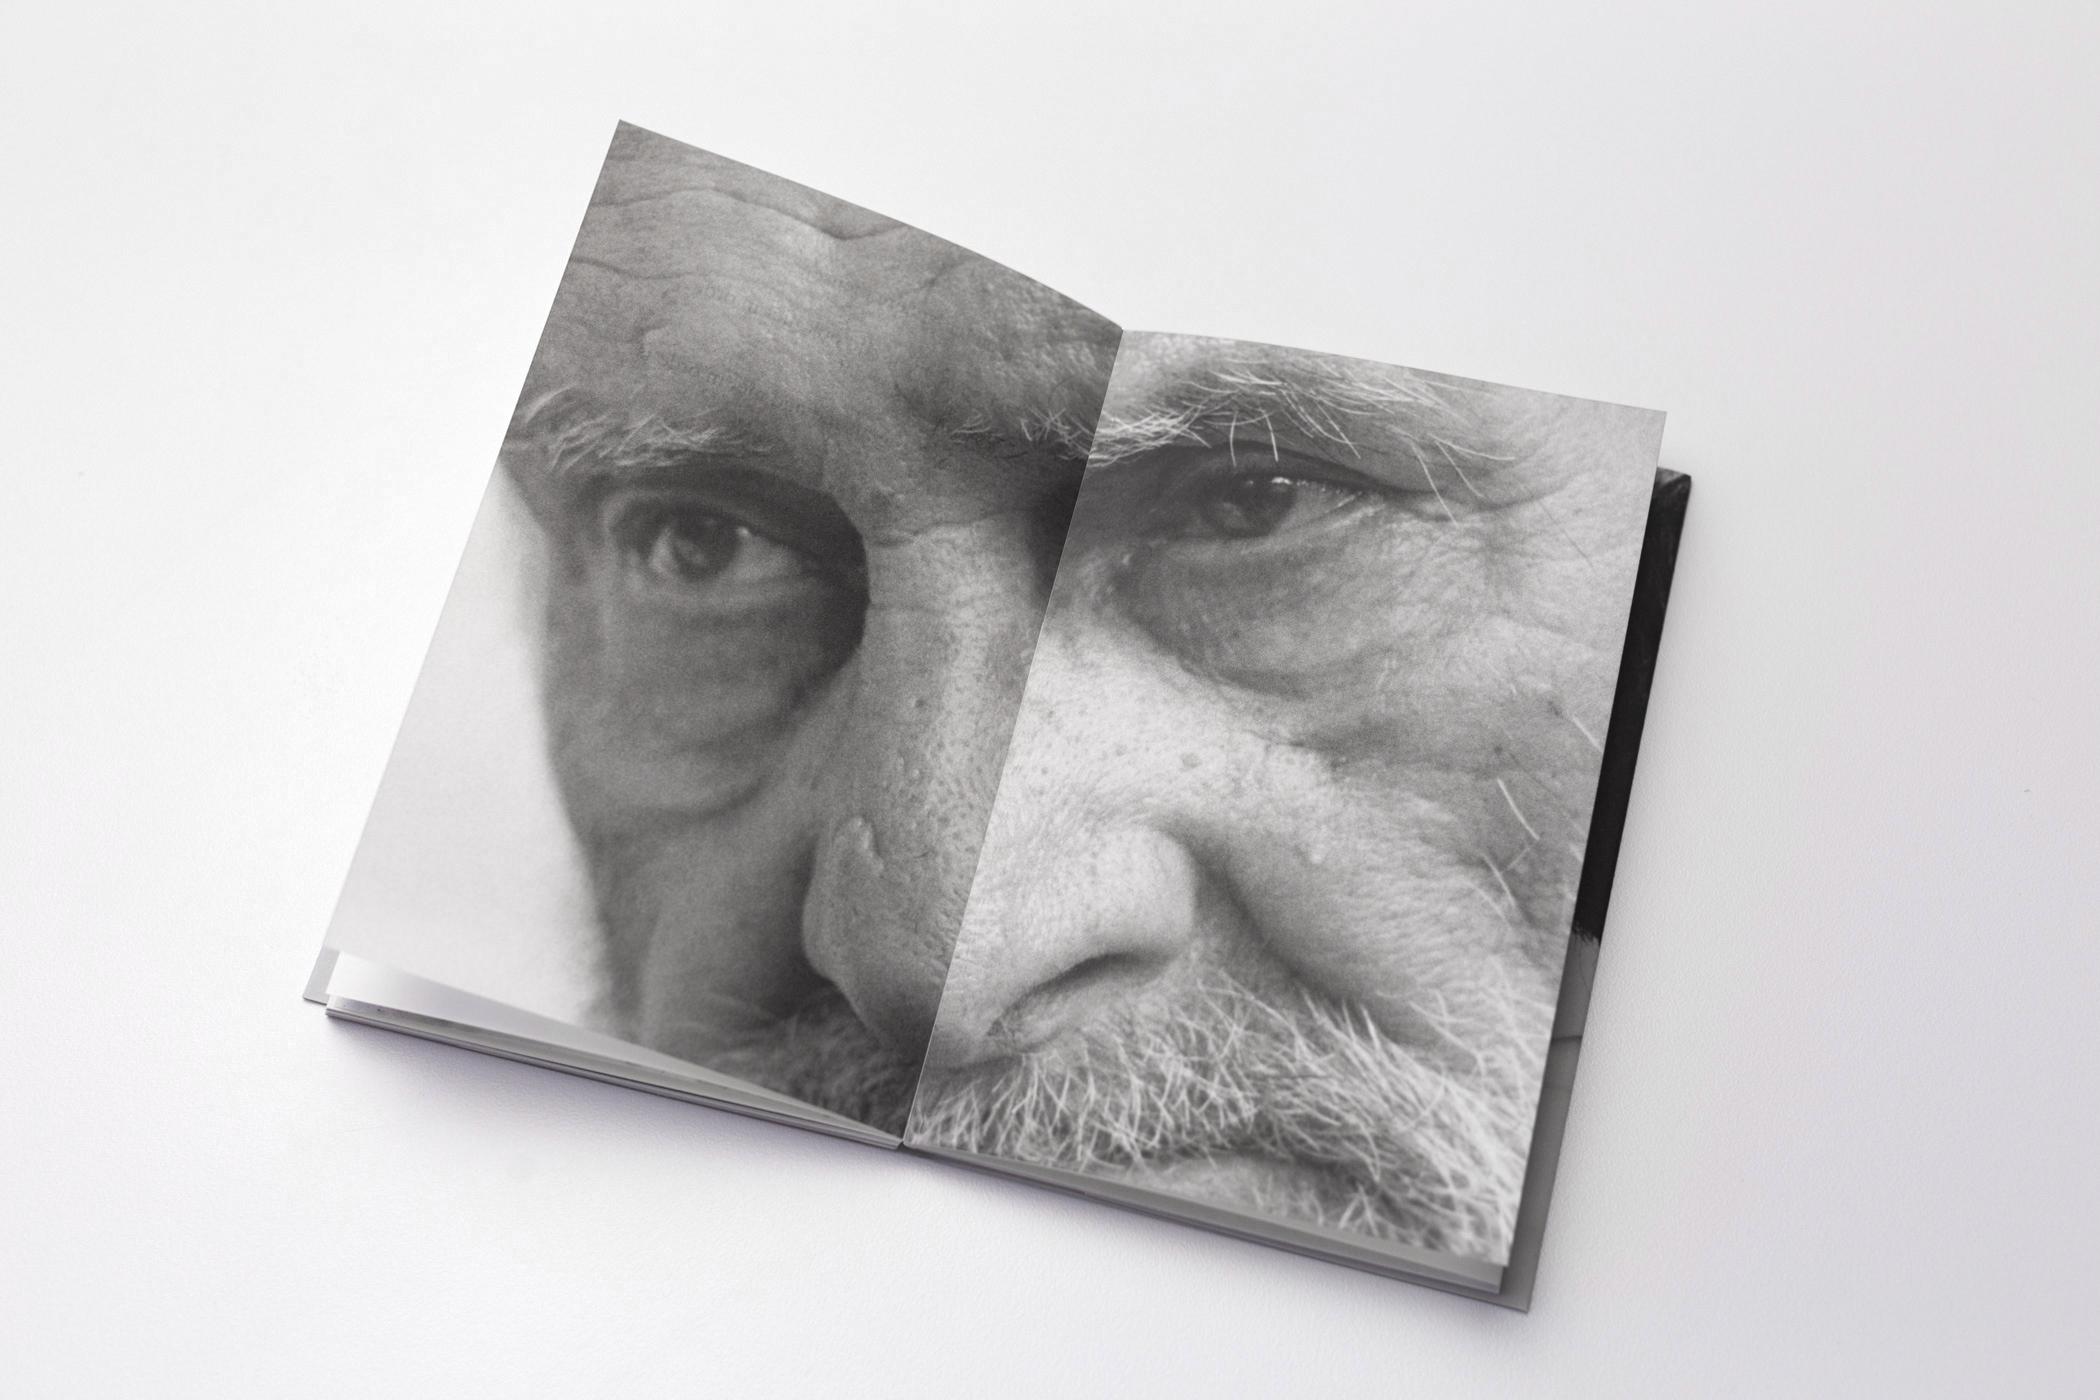 photographs of the book by  Justina Nekrasaite  for  De Monsterkamer